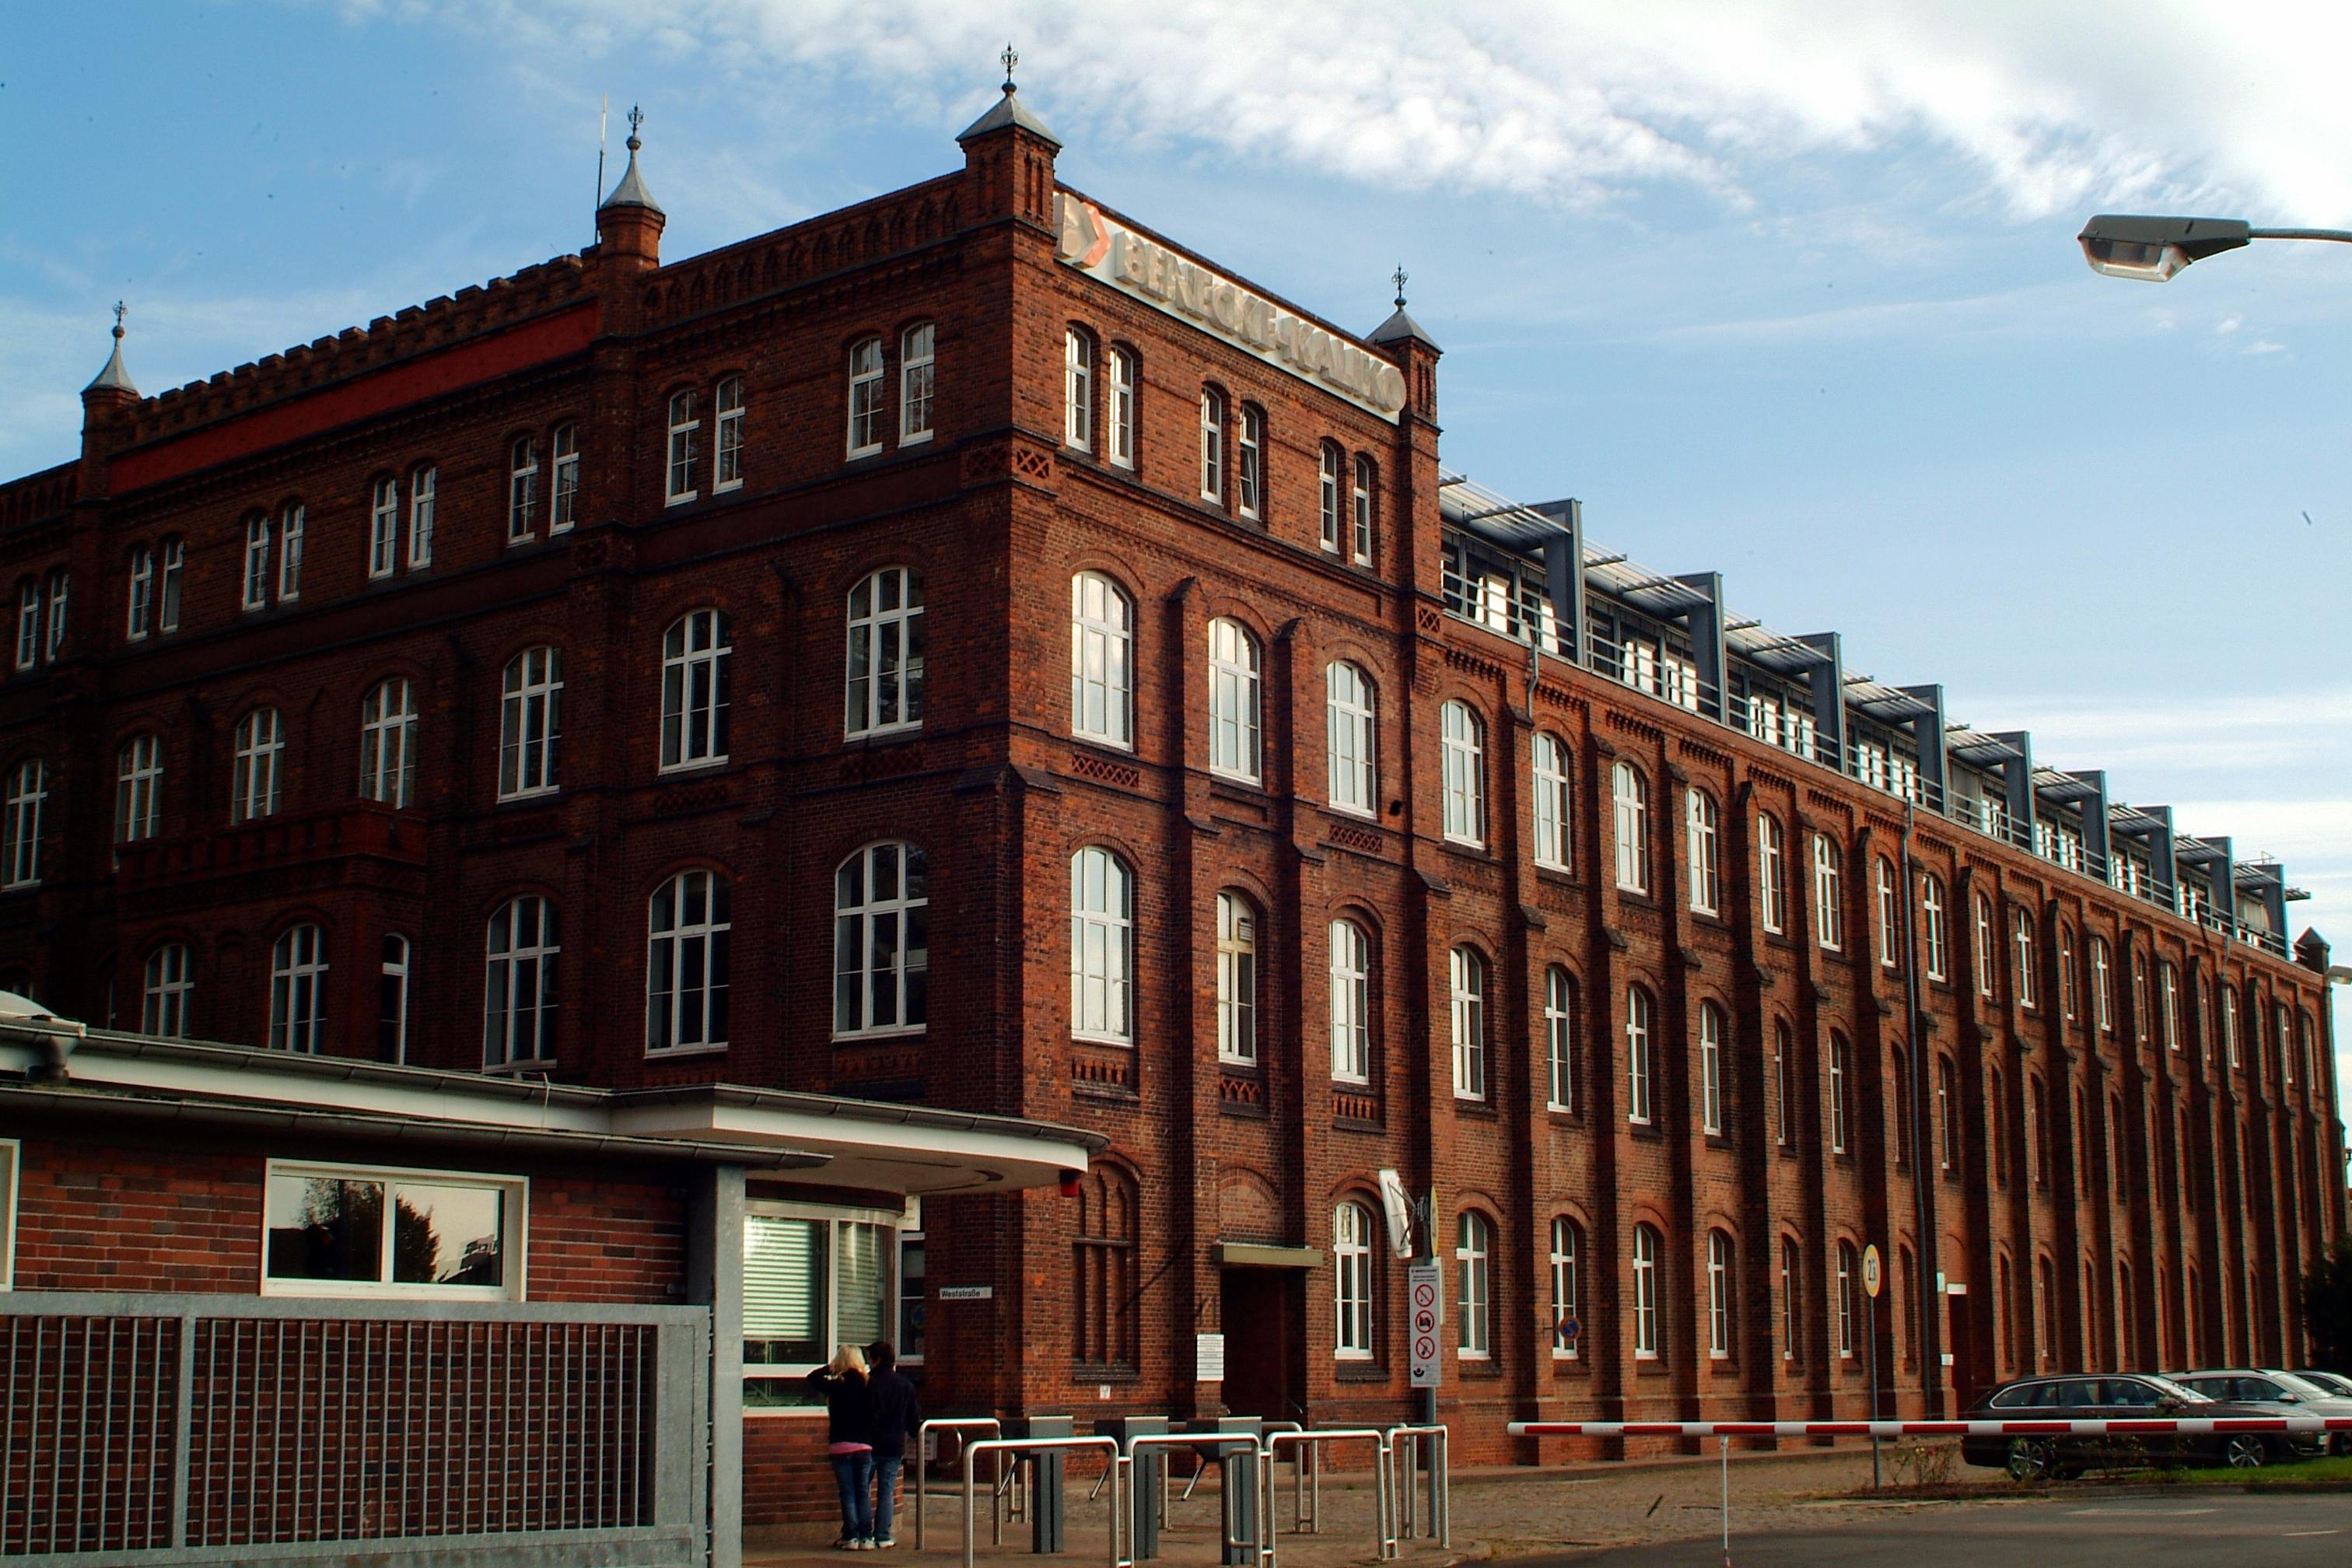 Architekt Hannover file benecke kaliko ag beneckeallee 40 30419 hannover vinnhorst